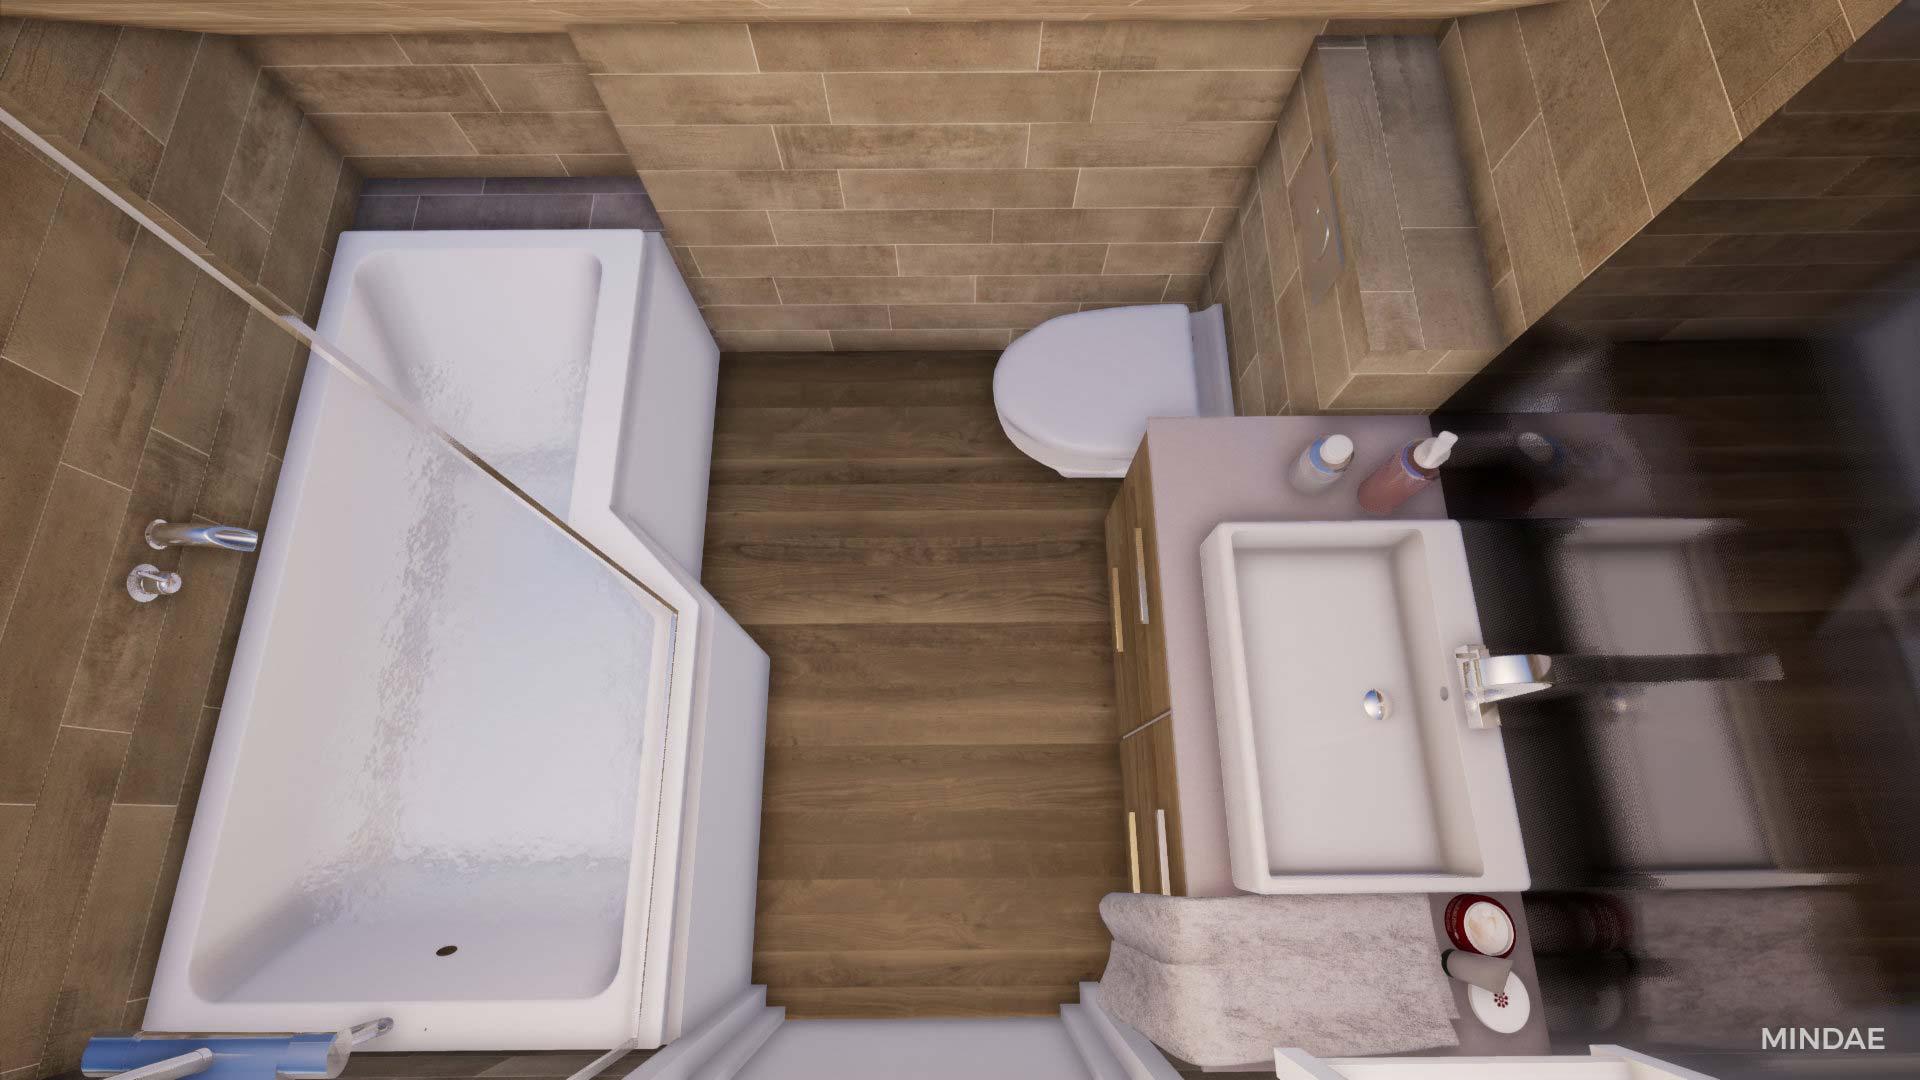 Mindae_3D_SDB_salle_de_bain_projet_renovation_2G_plomberie_calvados-(3)